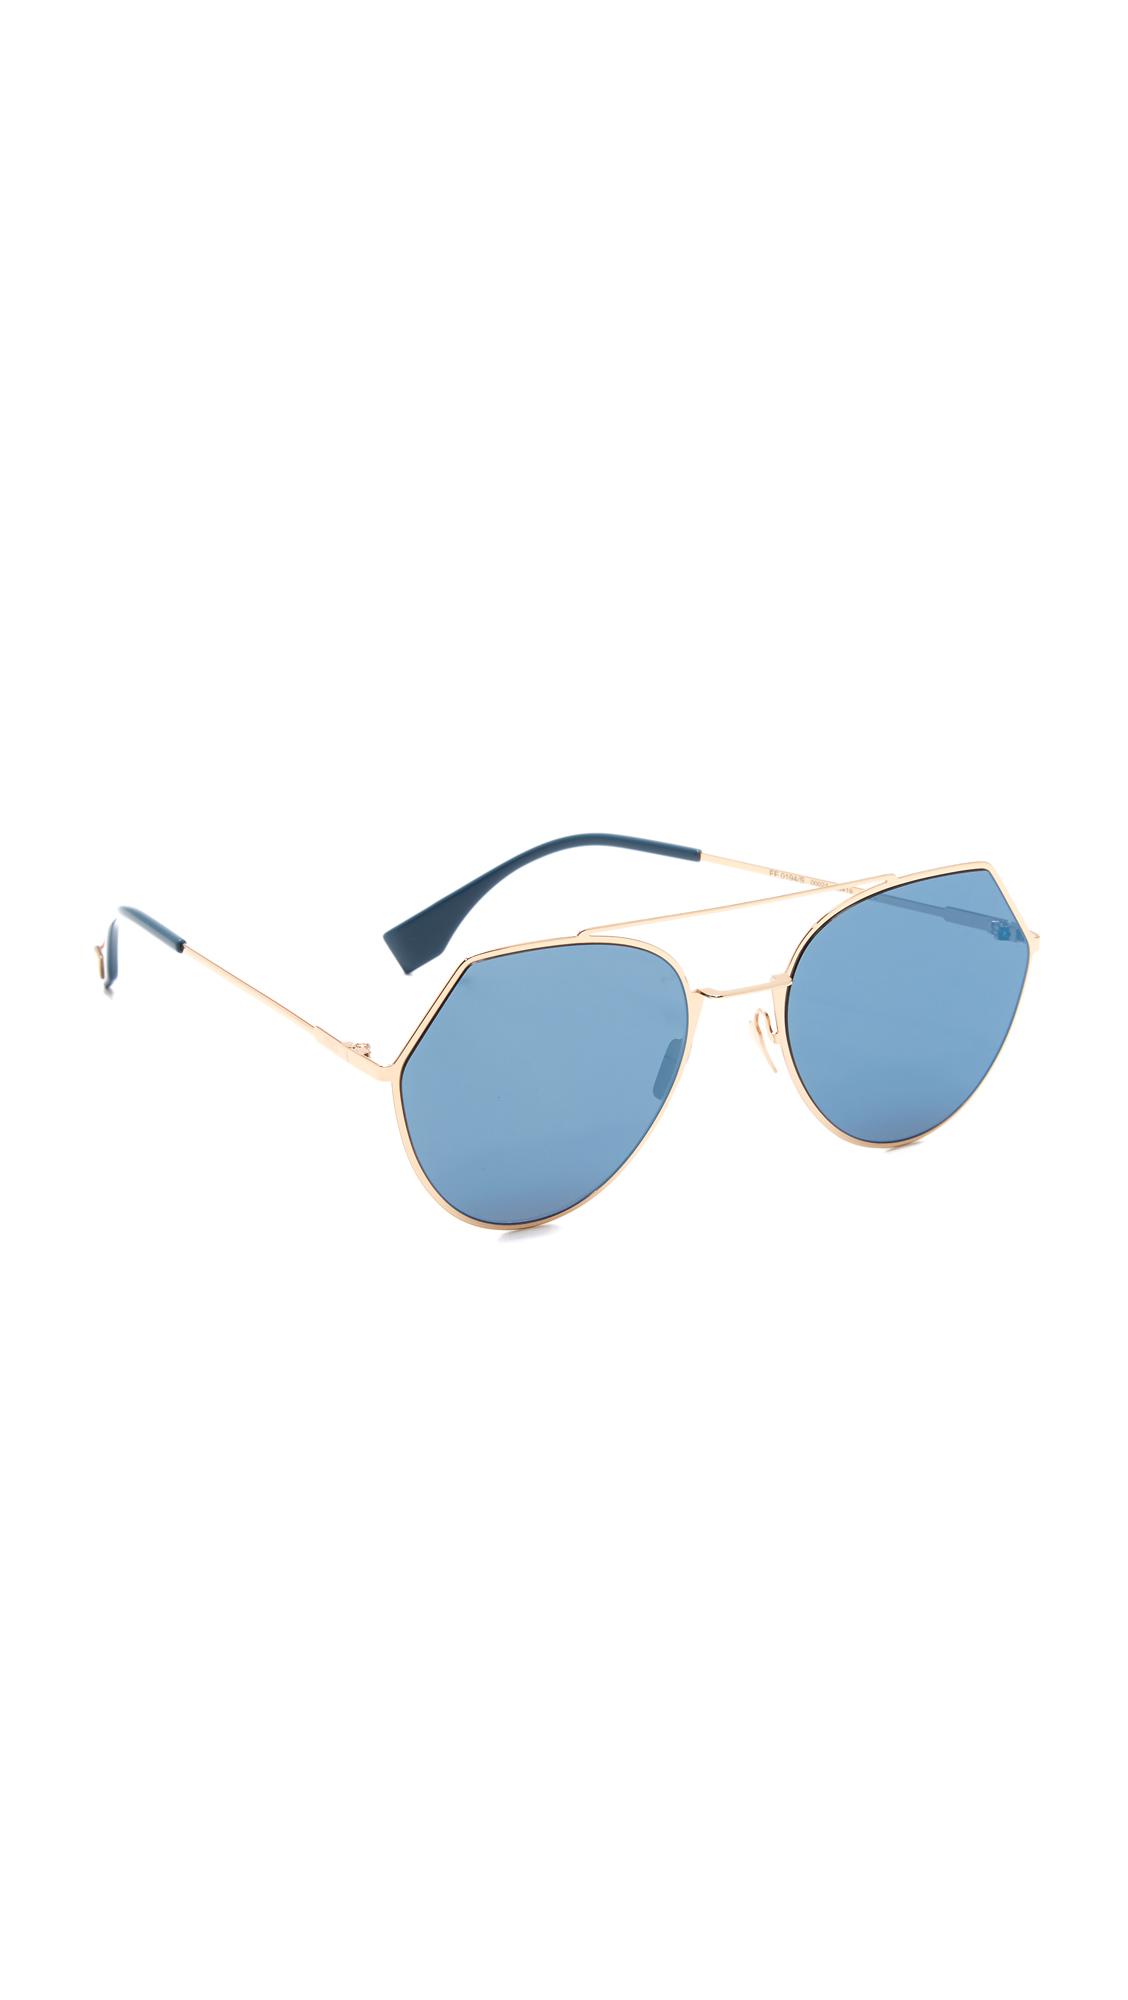 Fendi Aviator Sunglasses - Rose Gold/Blue at Shopbop